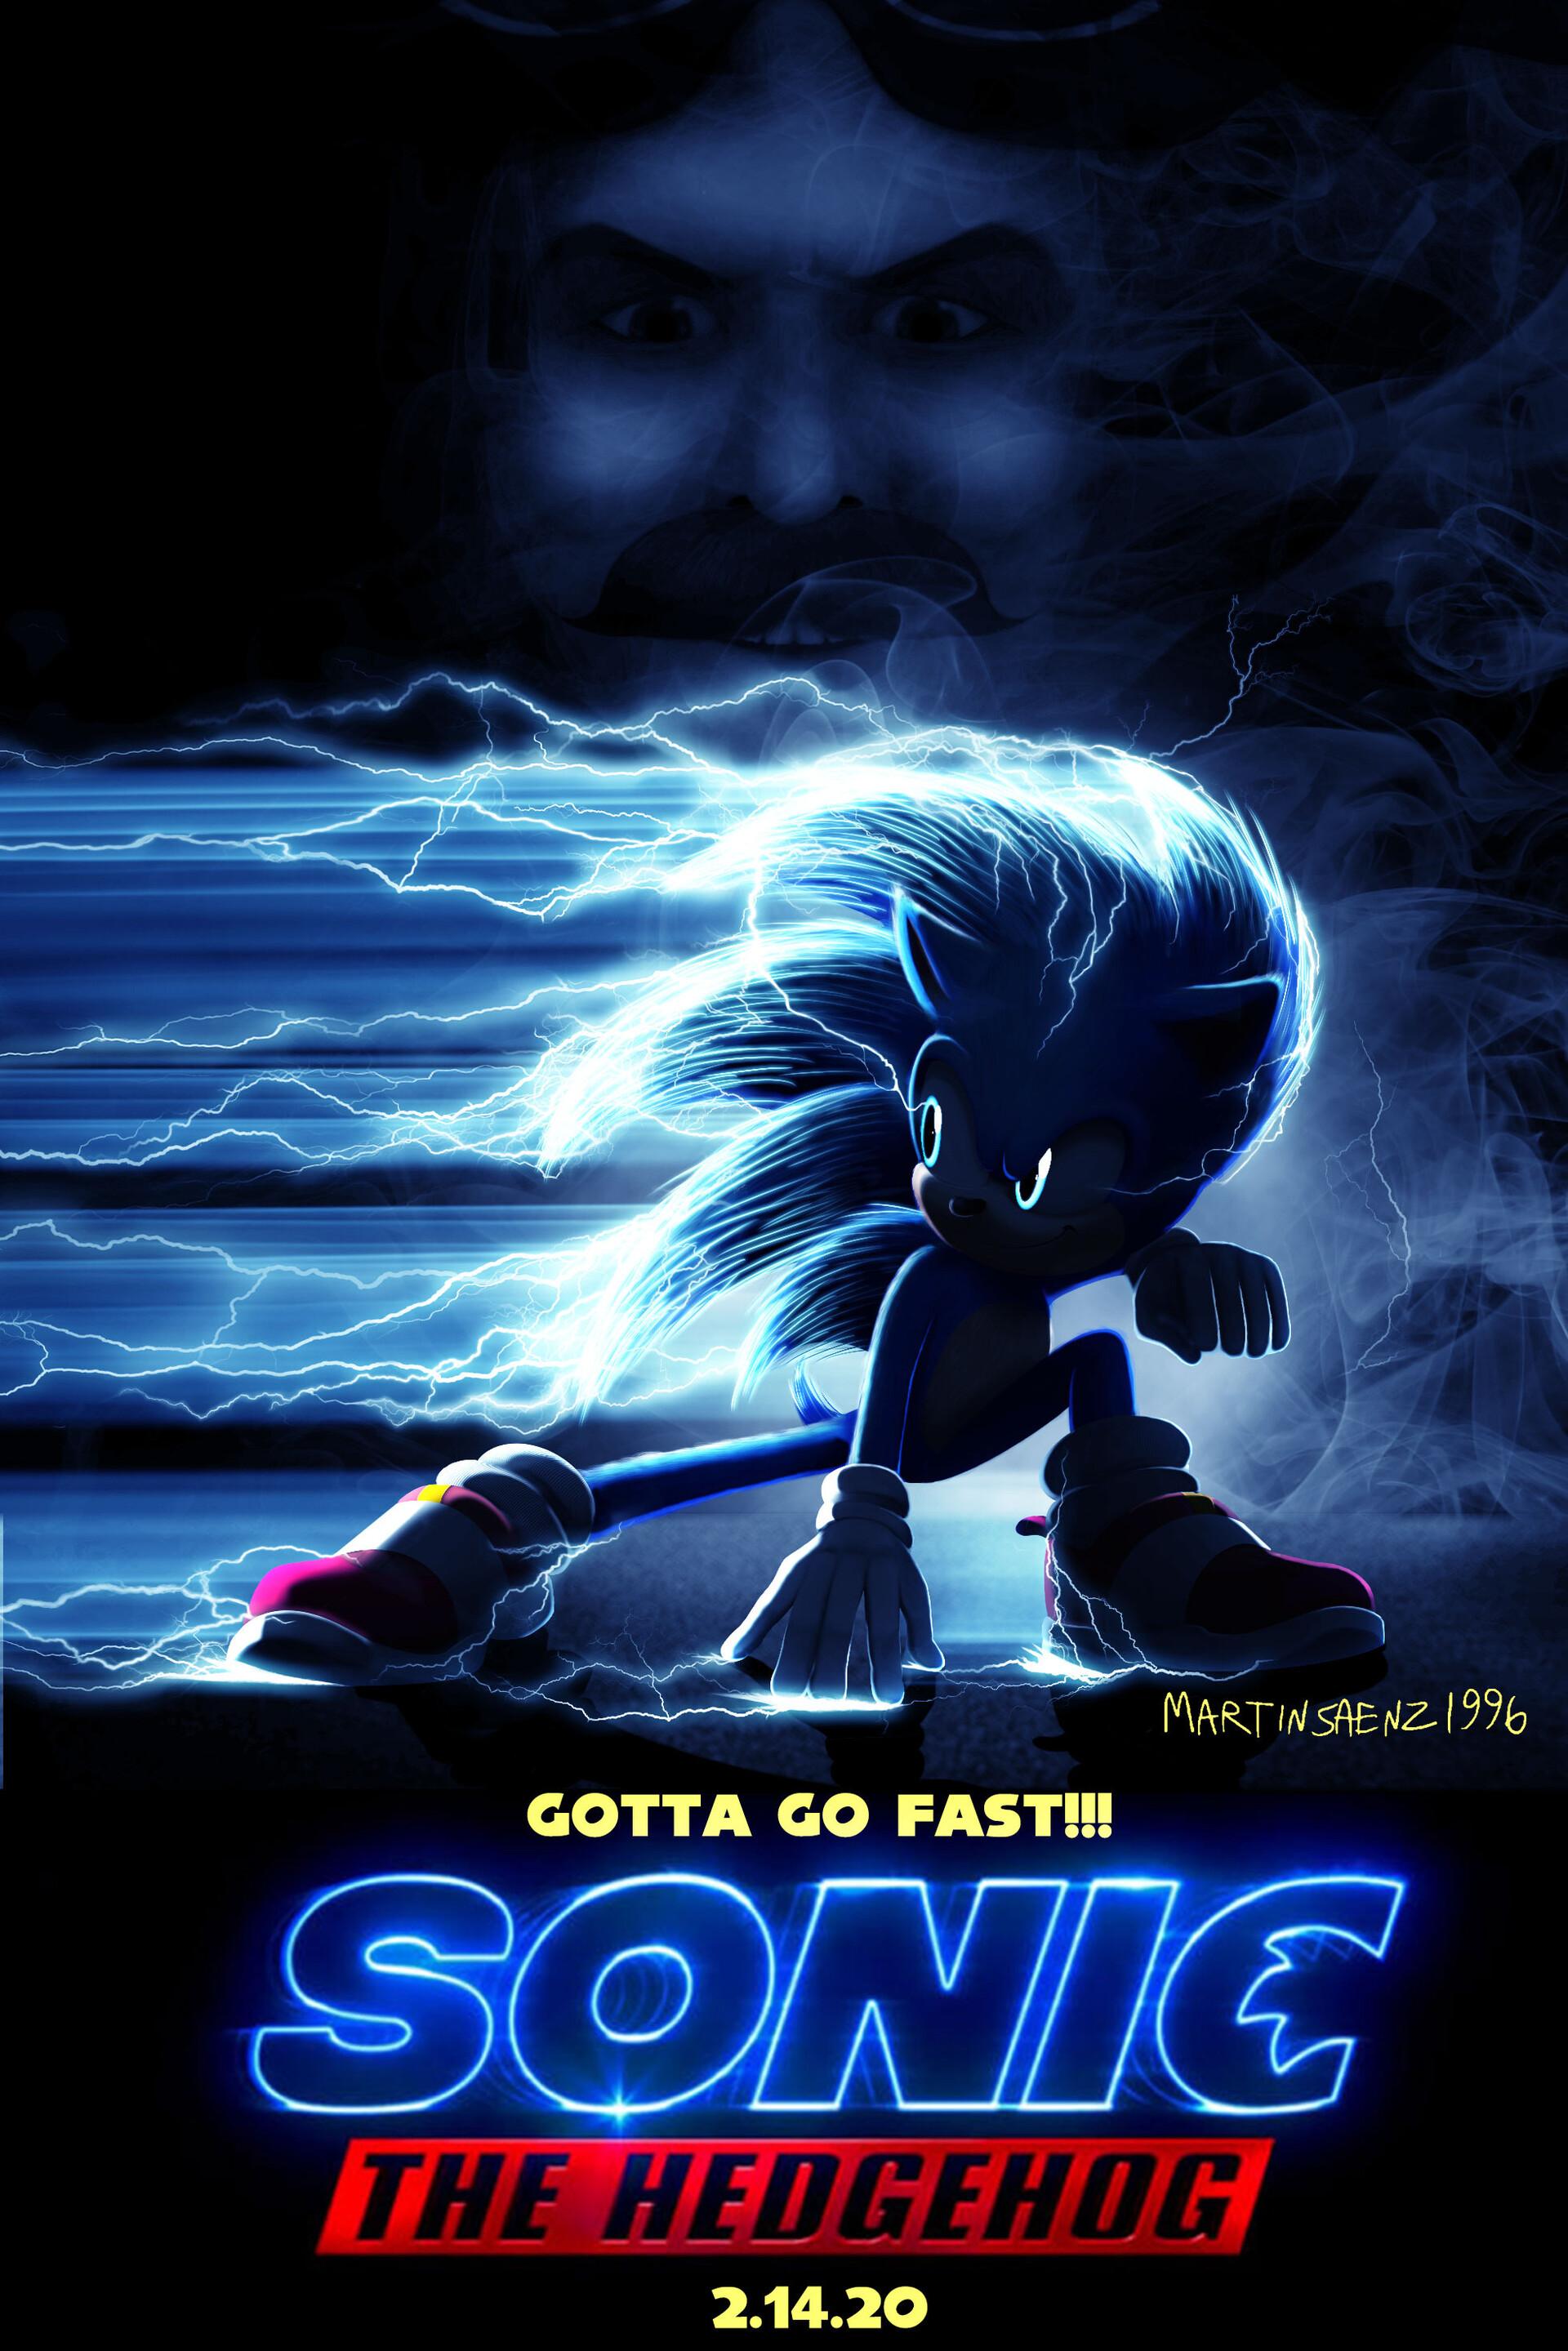 Artstation Sonic The Hedgehog Movie Poster Mockup Martin Saenz